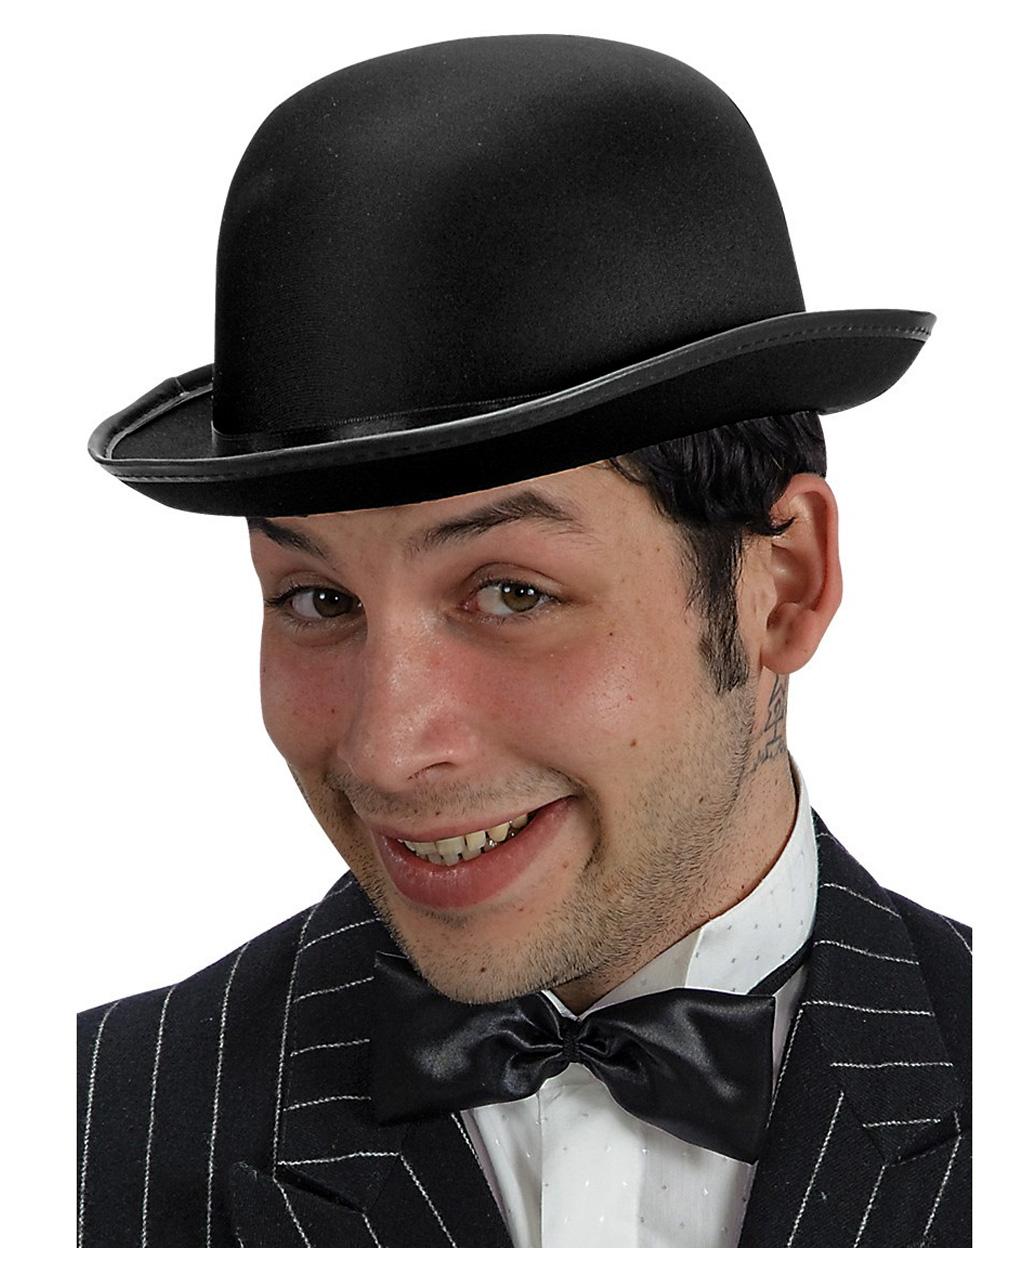 a7223b1c44fb7 Black melon   Bowler Buy Carnival hats   caps cheap